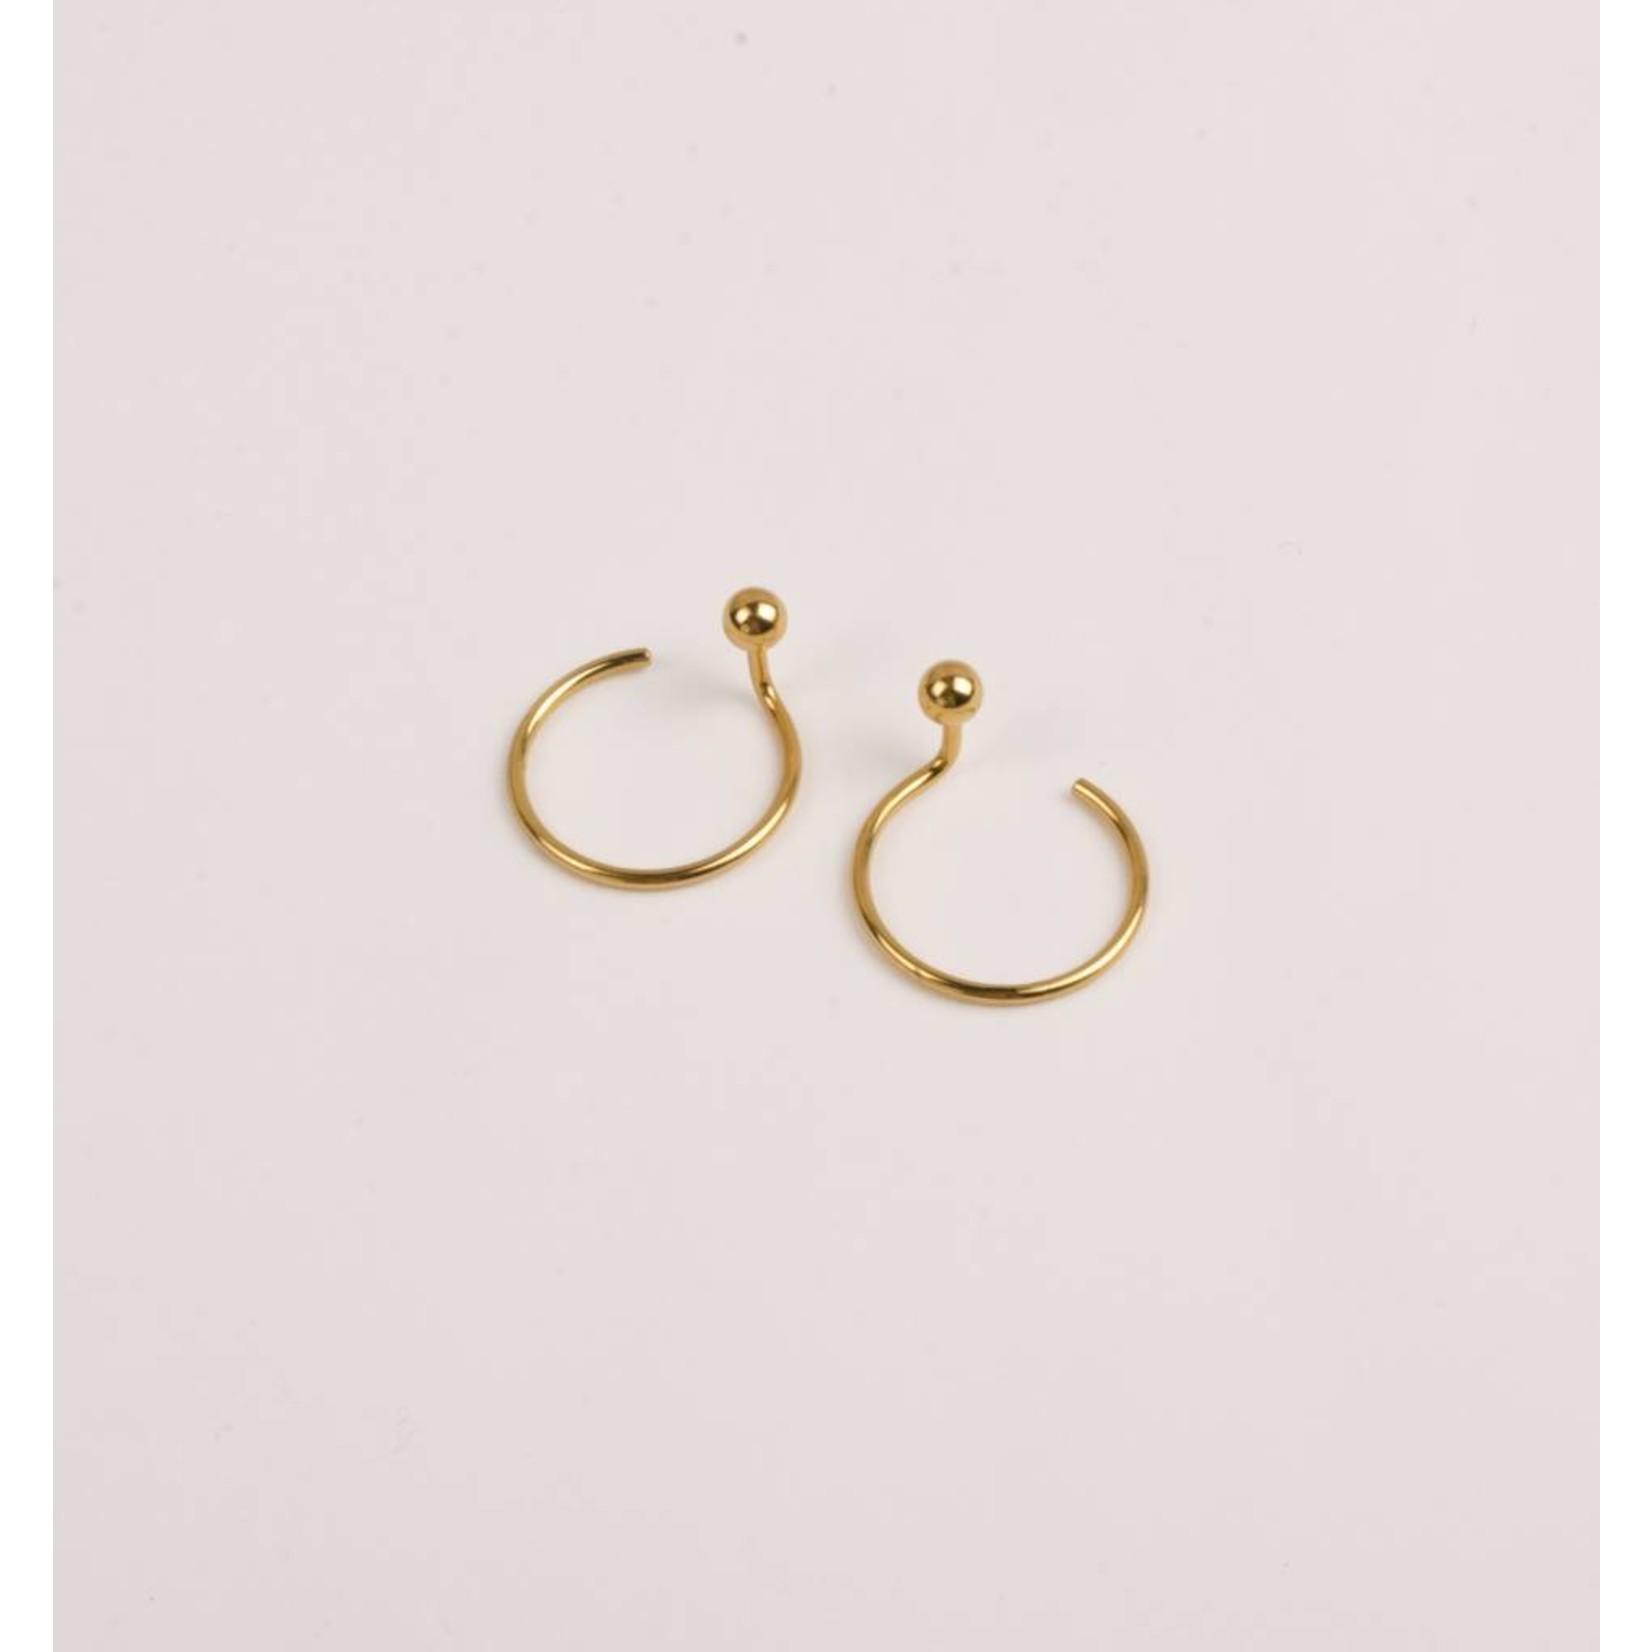 charlotte wooning earrings pluto gold